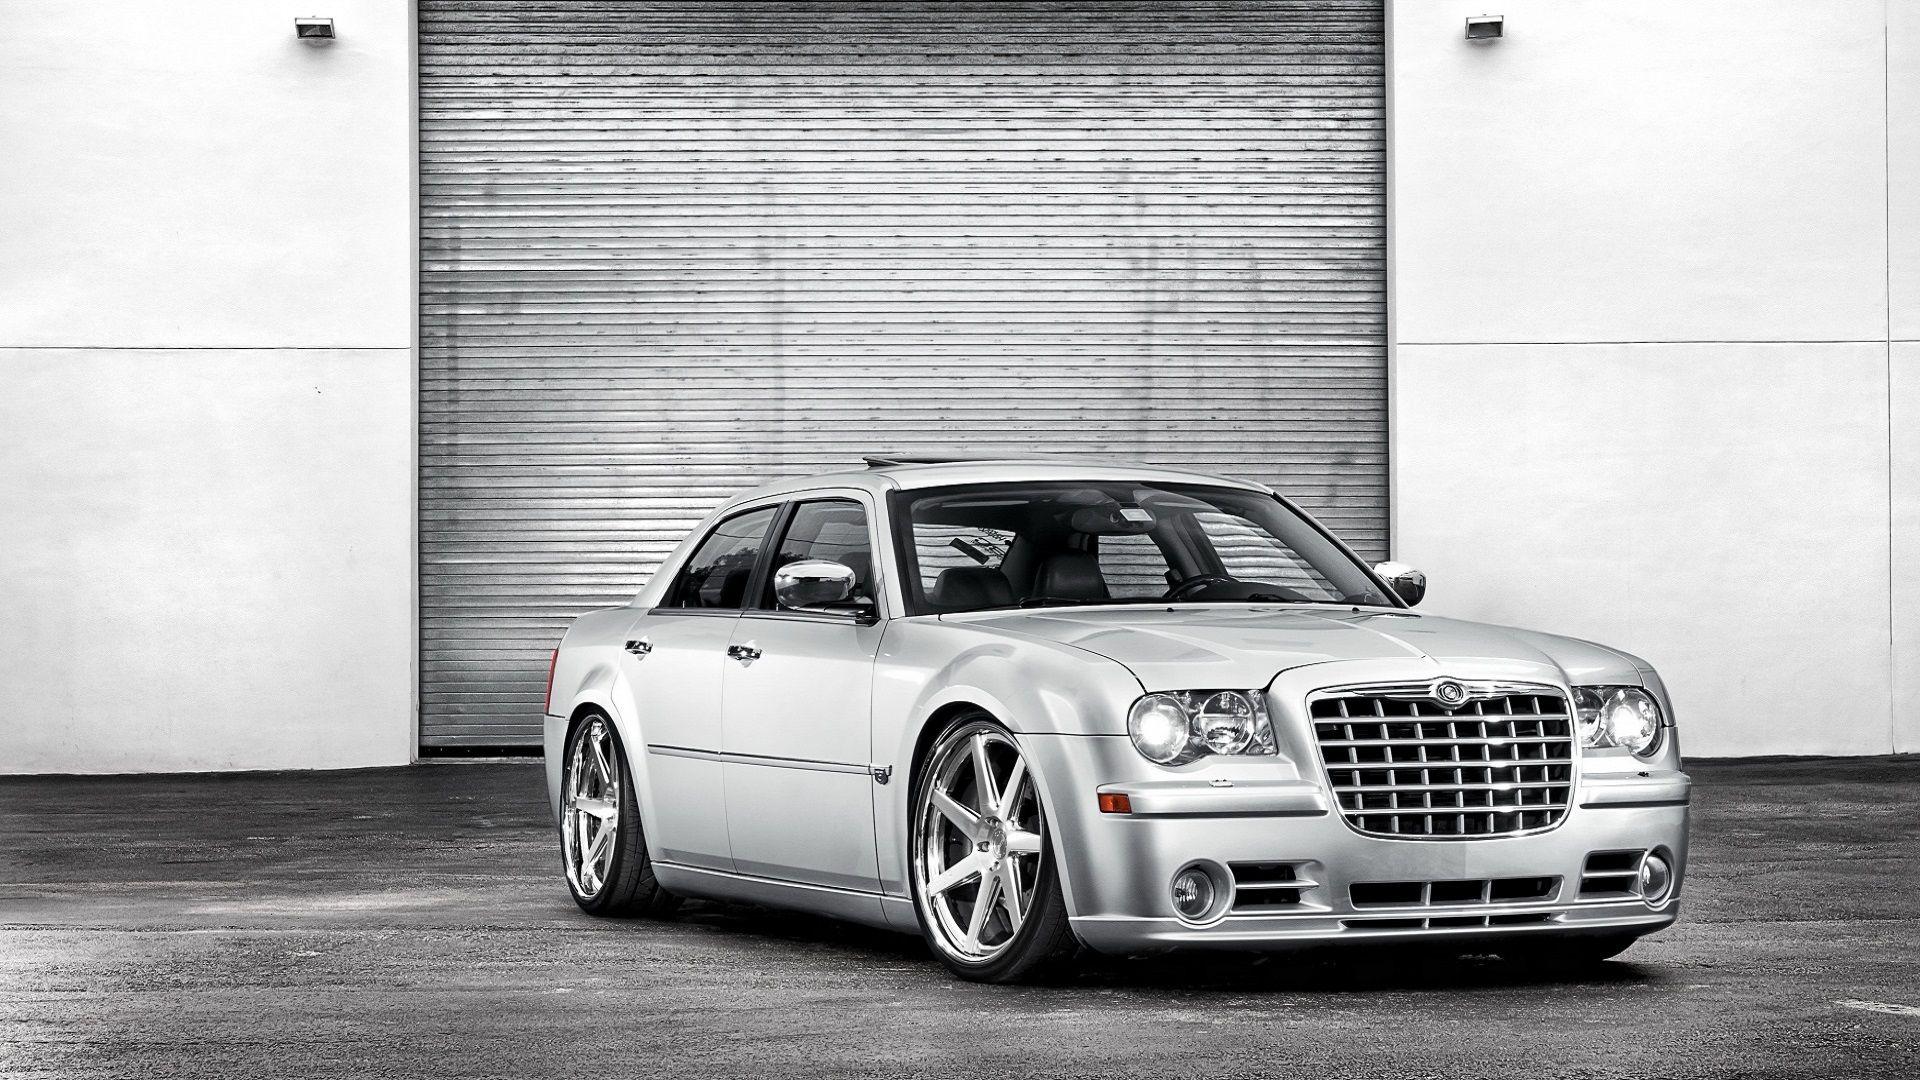 Chrysler 300m Wallpaper Hd Wallpaper At Wallpapersmap Com Car Chrysler 300m Chrysler